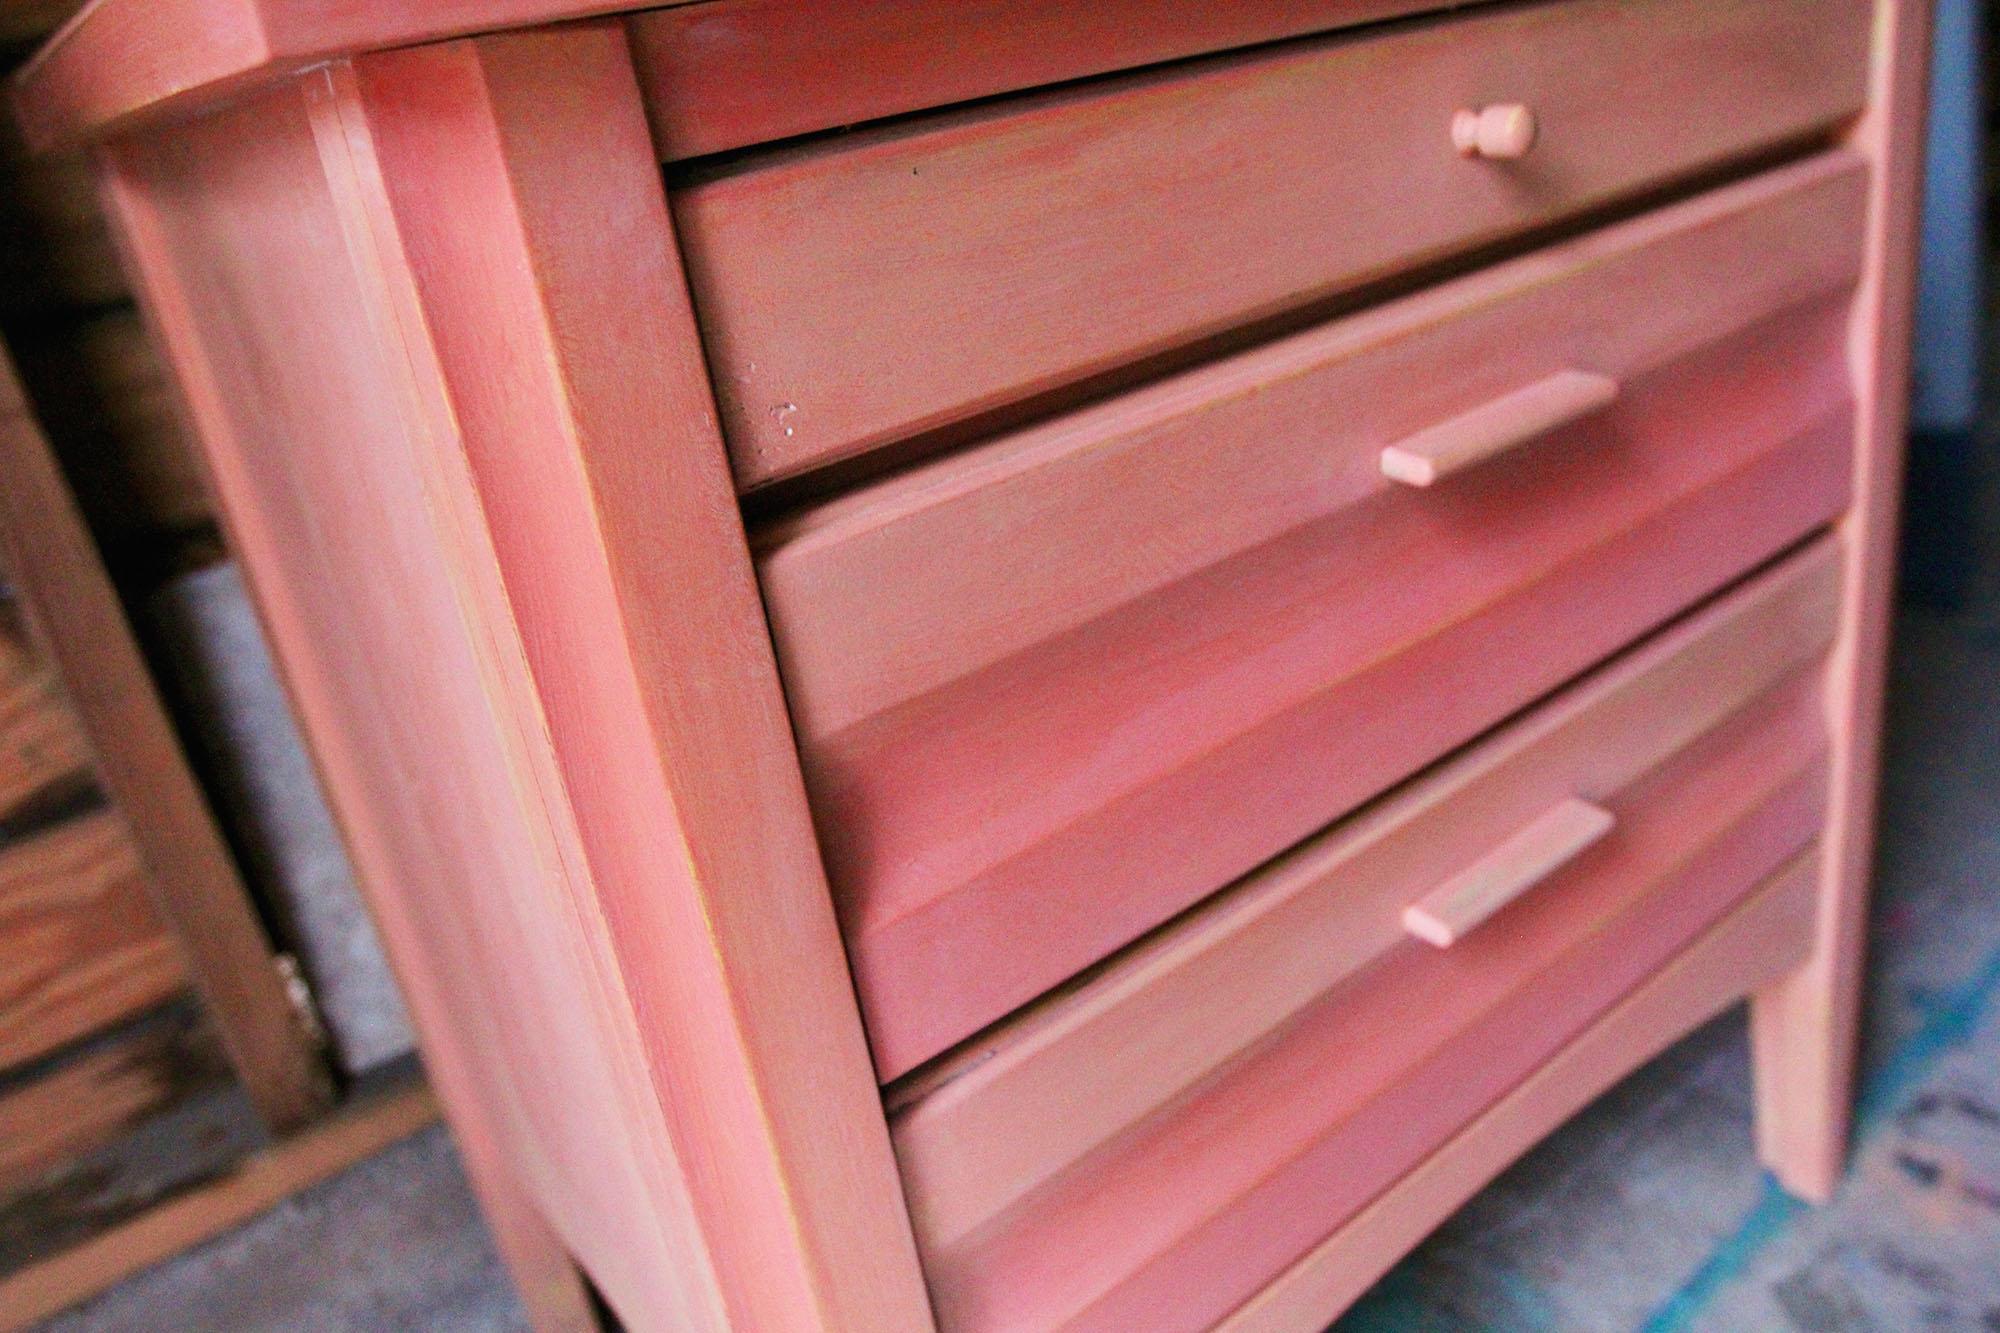 a-simpler-design-annie-sloan-sunset-ombre-dresser-coral-pinkjpg1.jpg